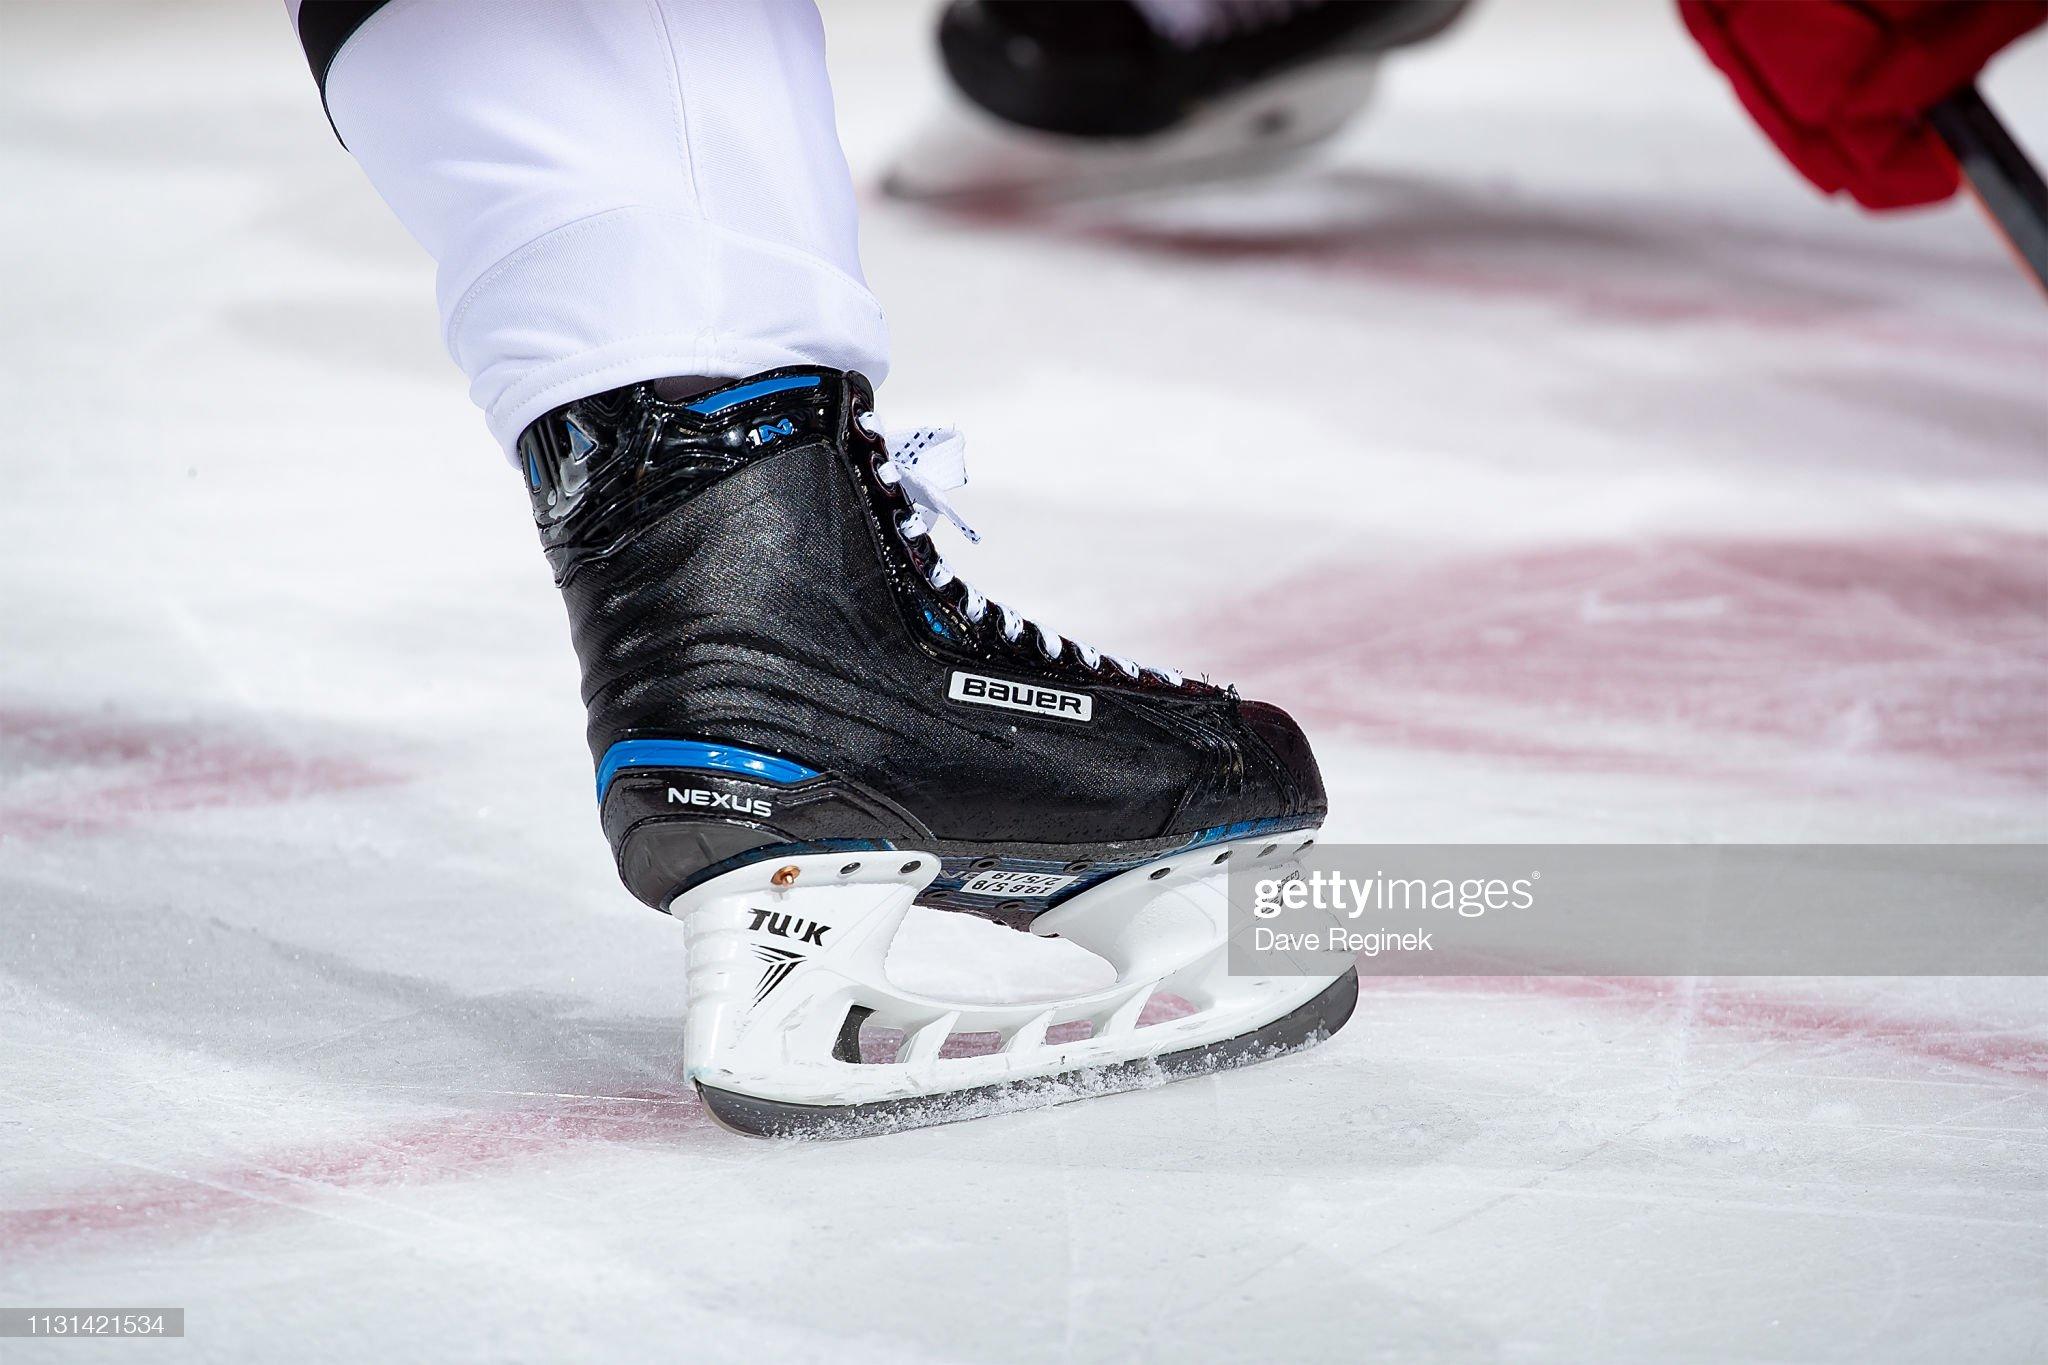 the-bauer-nexus-skates-of-jonathan-toews